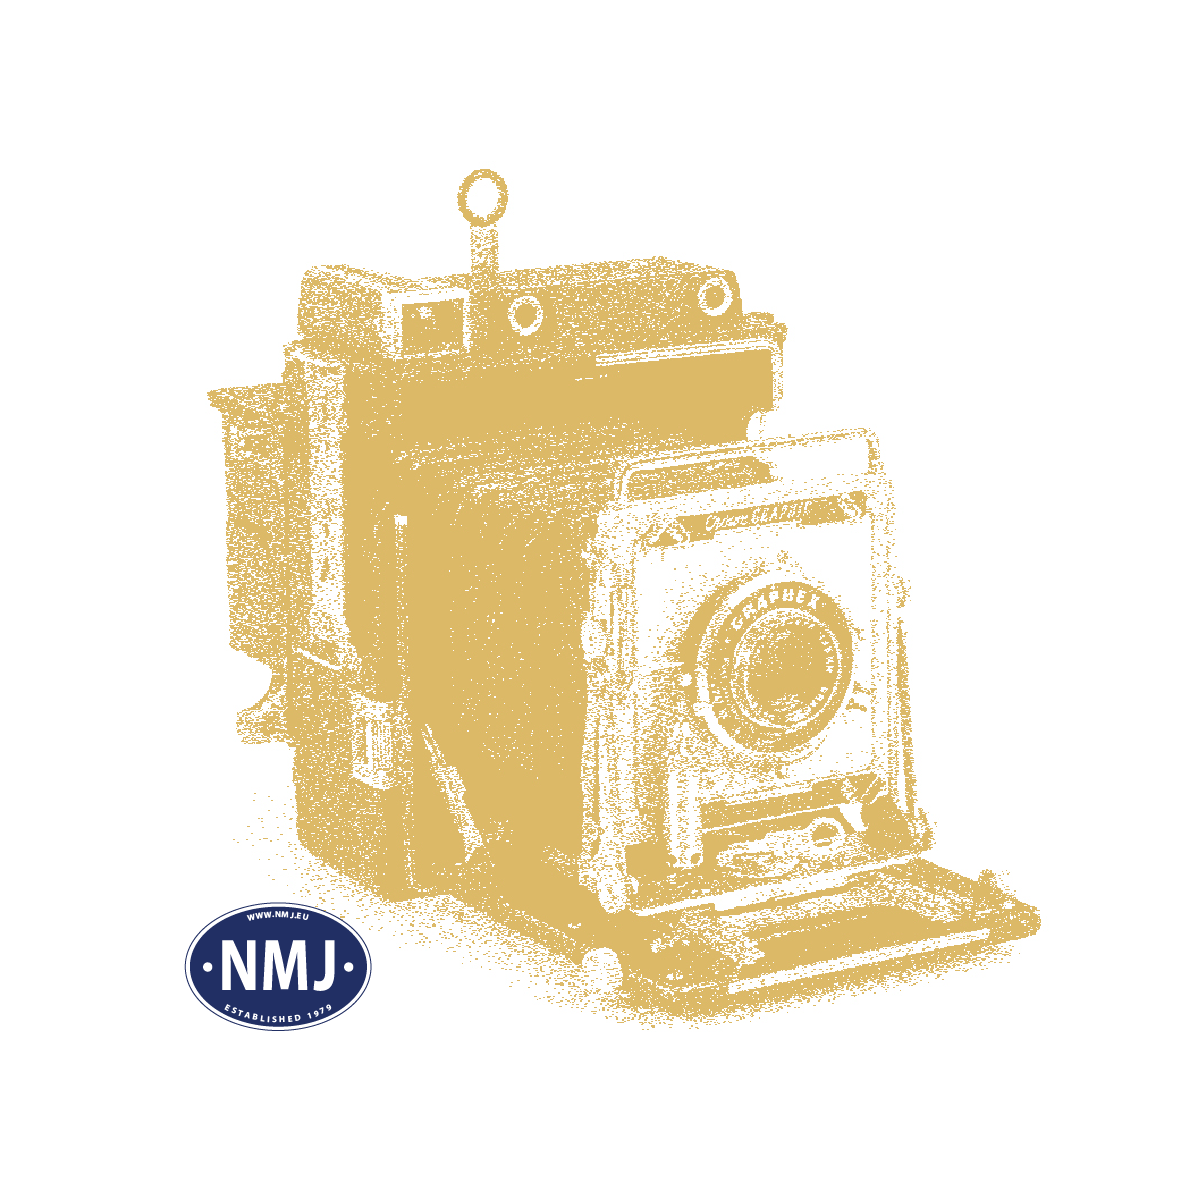 "NOC12036 - ""Ved innsjøen"", pakke med figurer og redskapsskur"